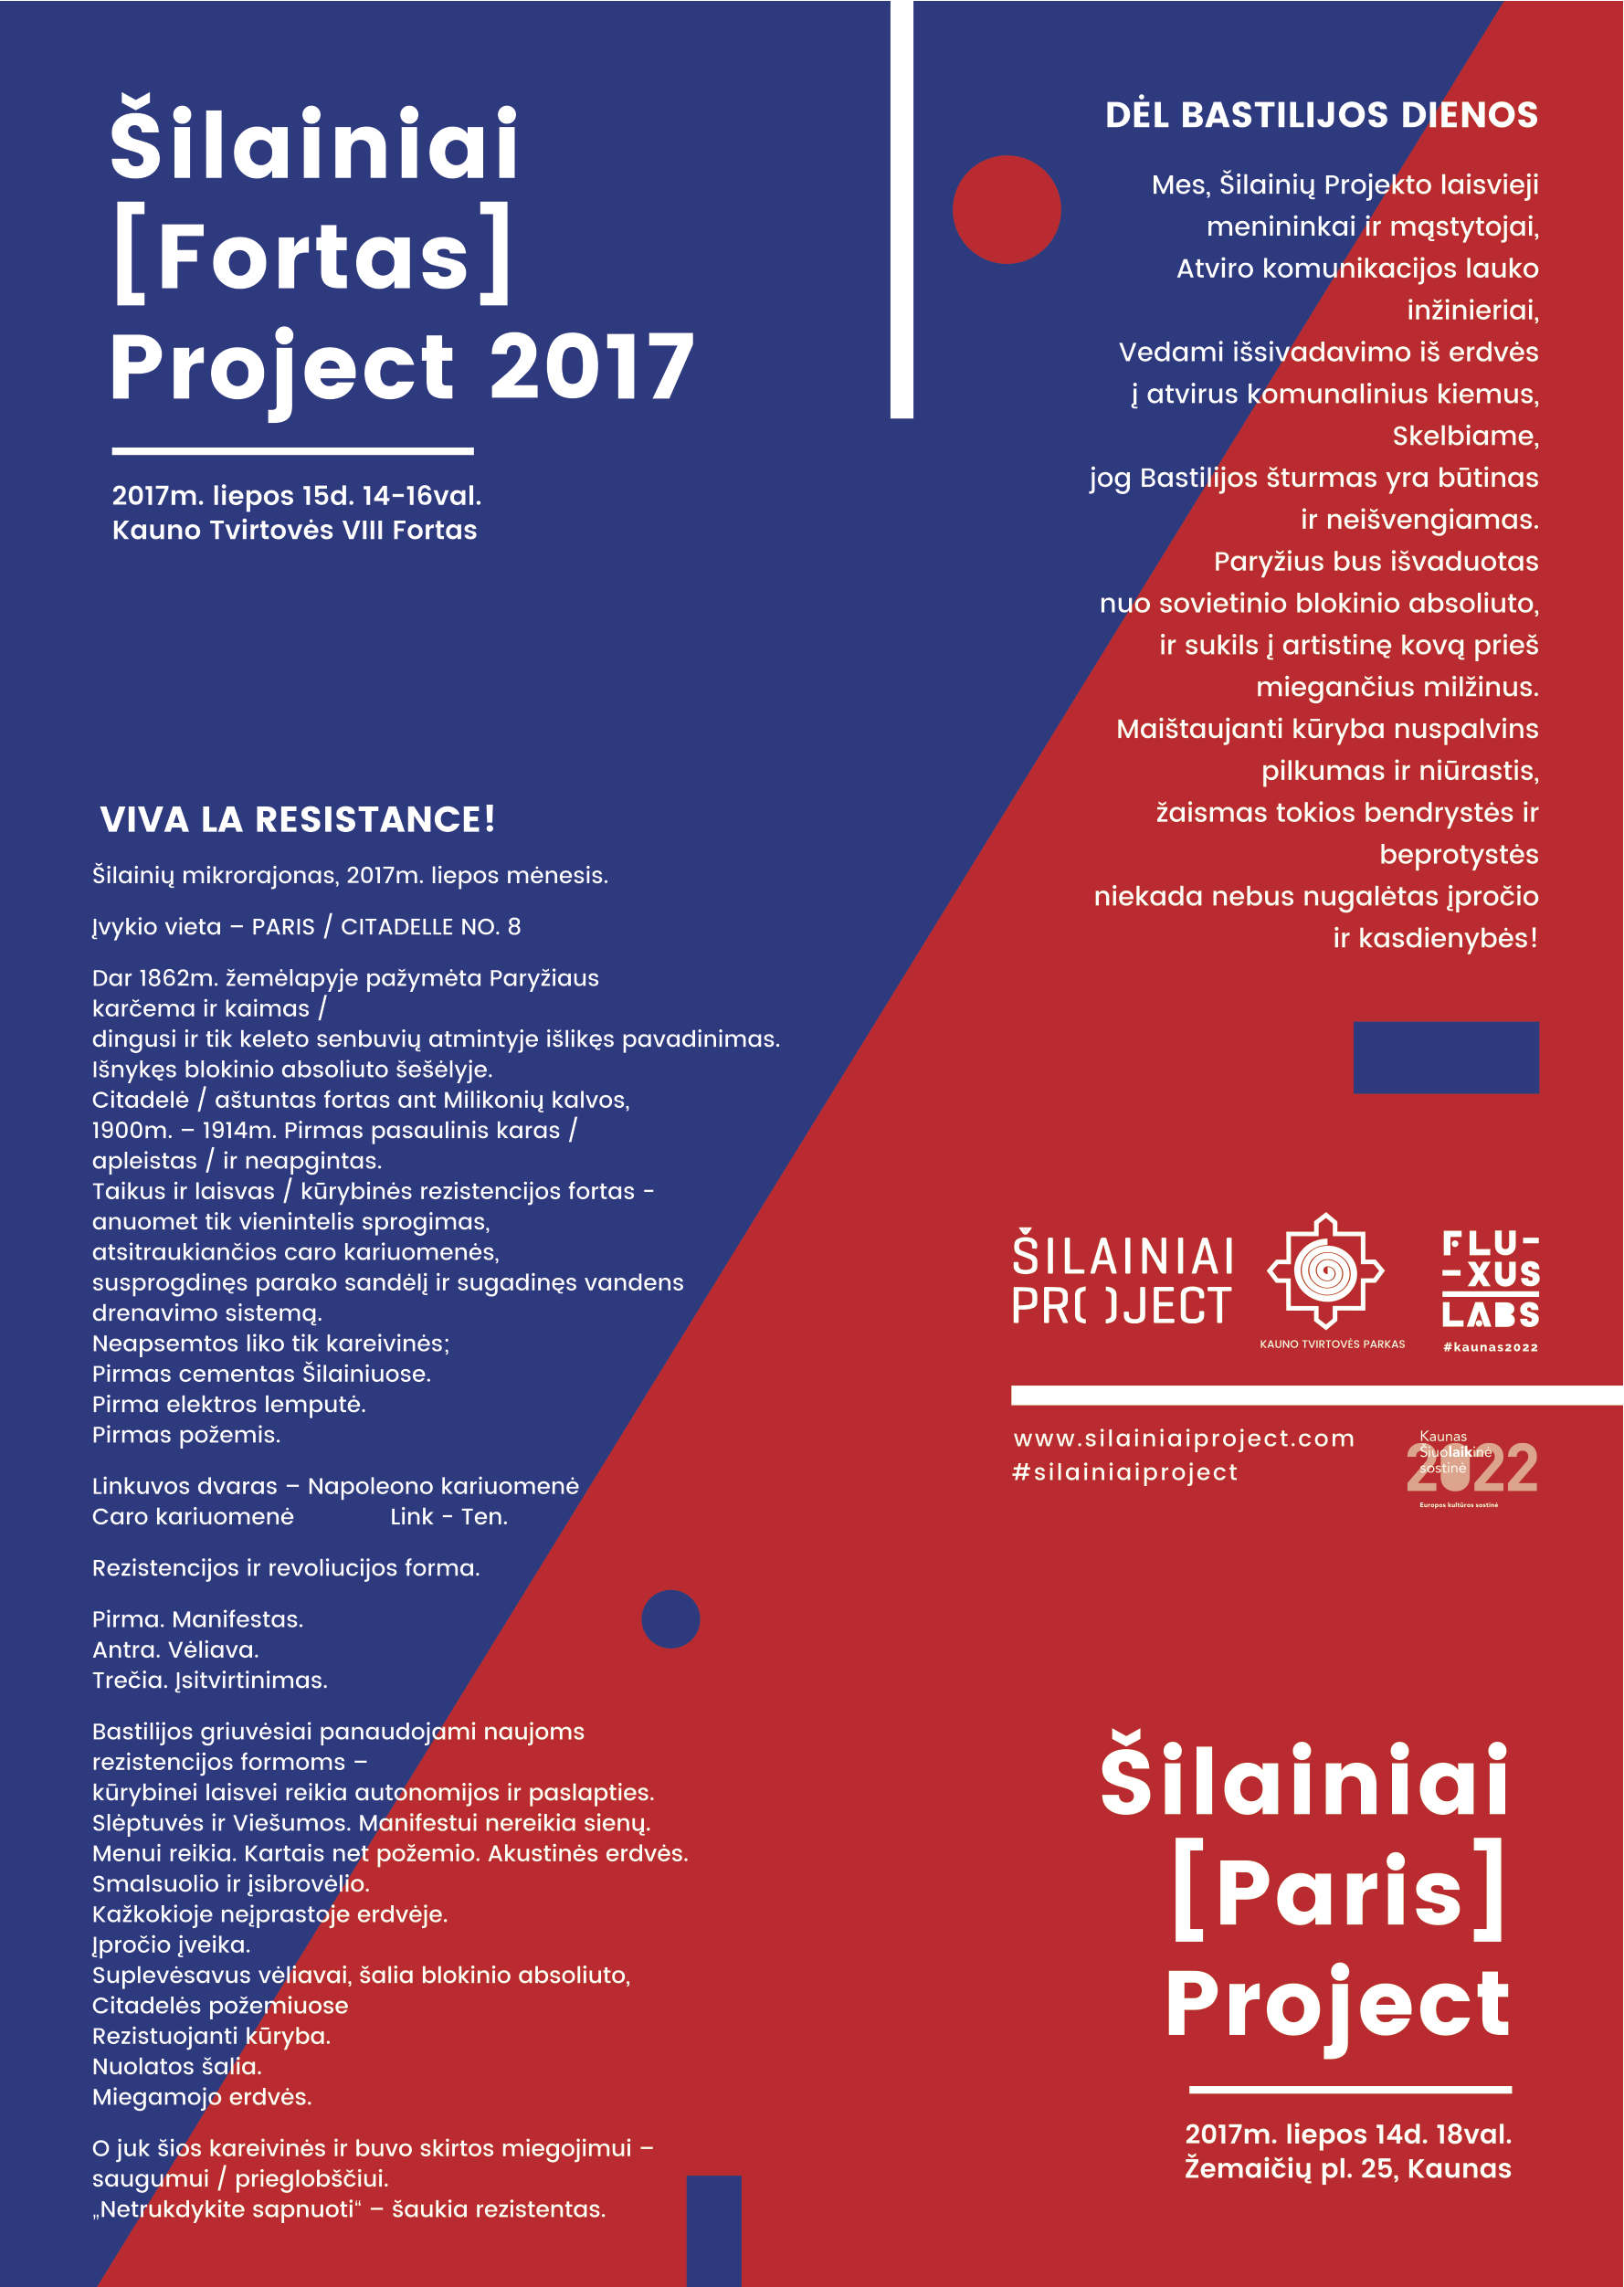 Silainiai_Project_Map_Manifesto